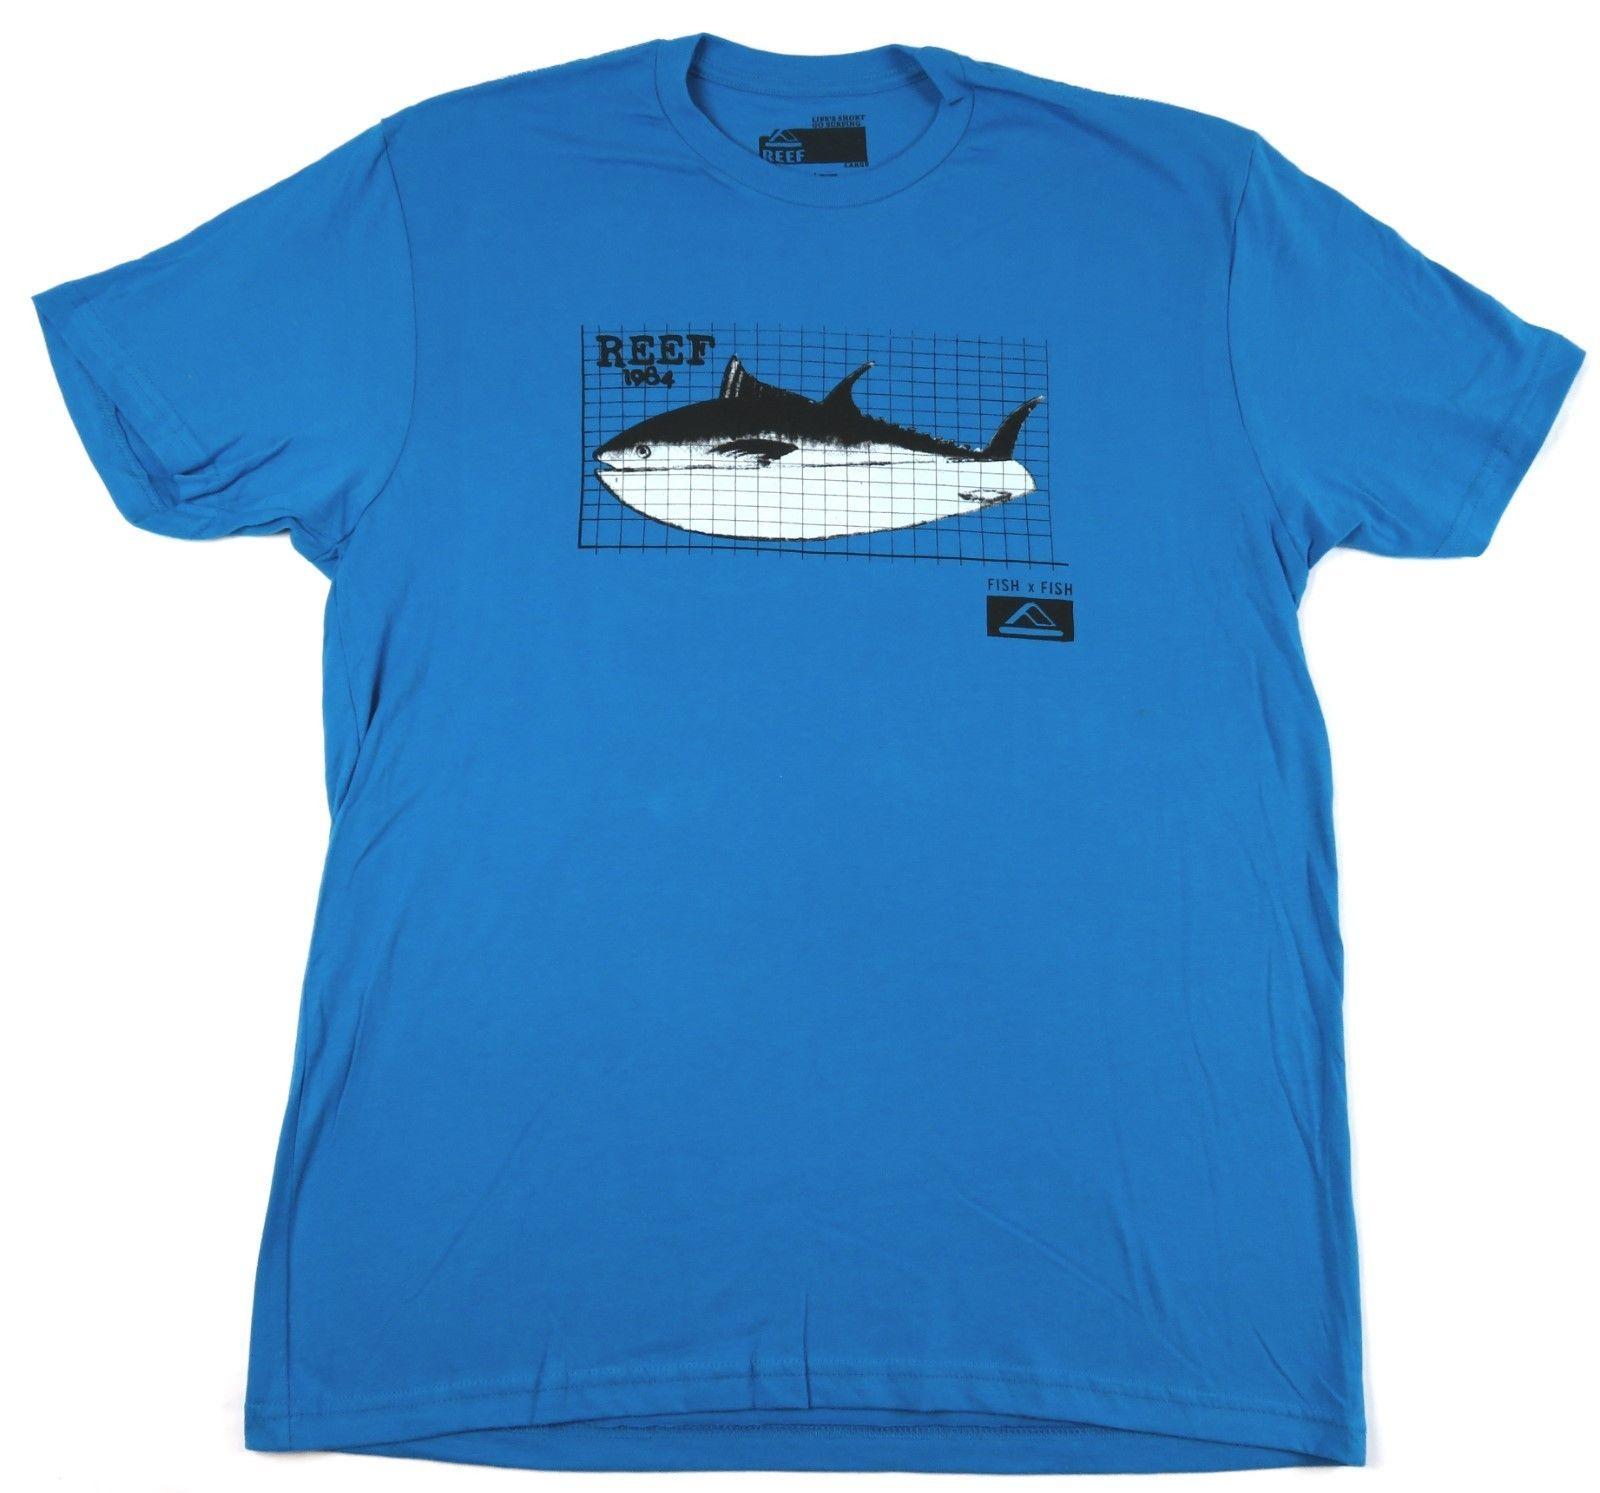 Men's REEF Tee Shirt Surfing Beach Casual Fish T-shirt Royal Blue 1984